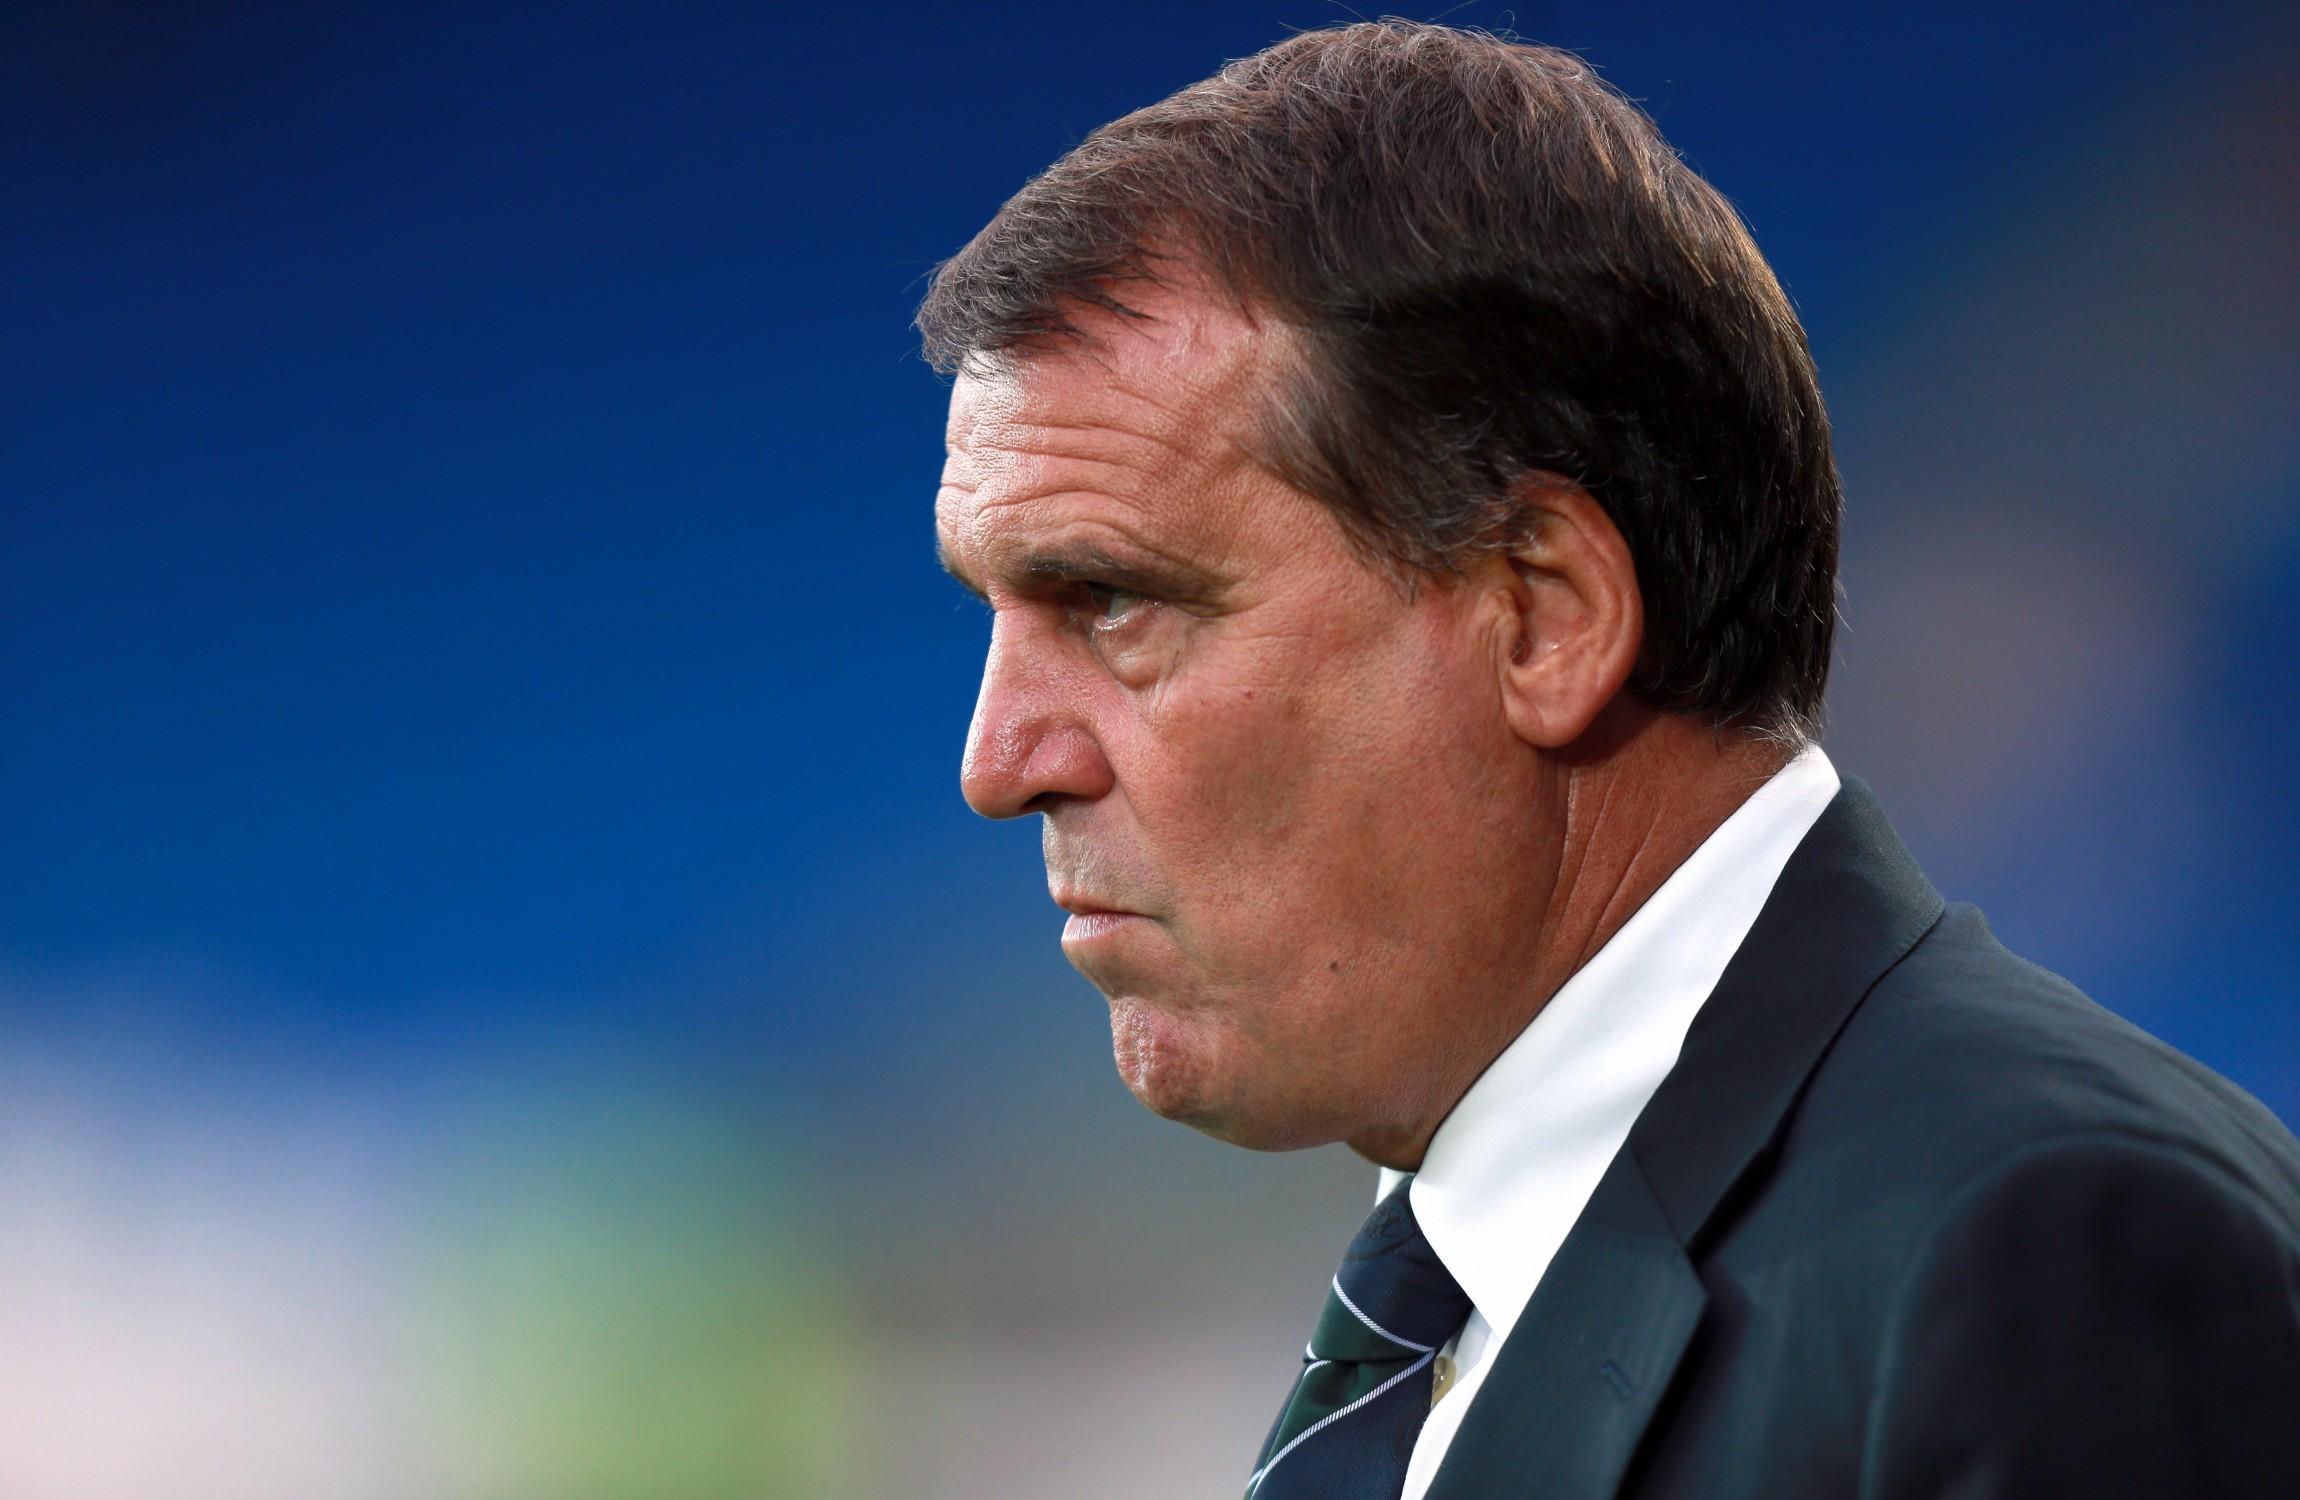 Italian legend Marco Tardelli says Ireland lack football intellect